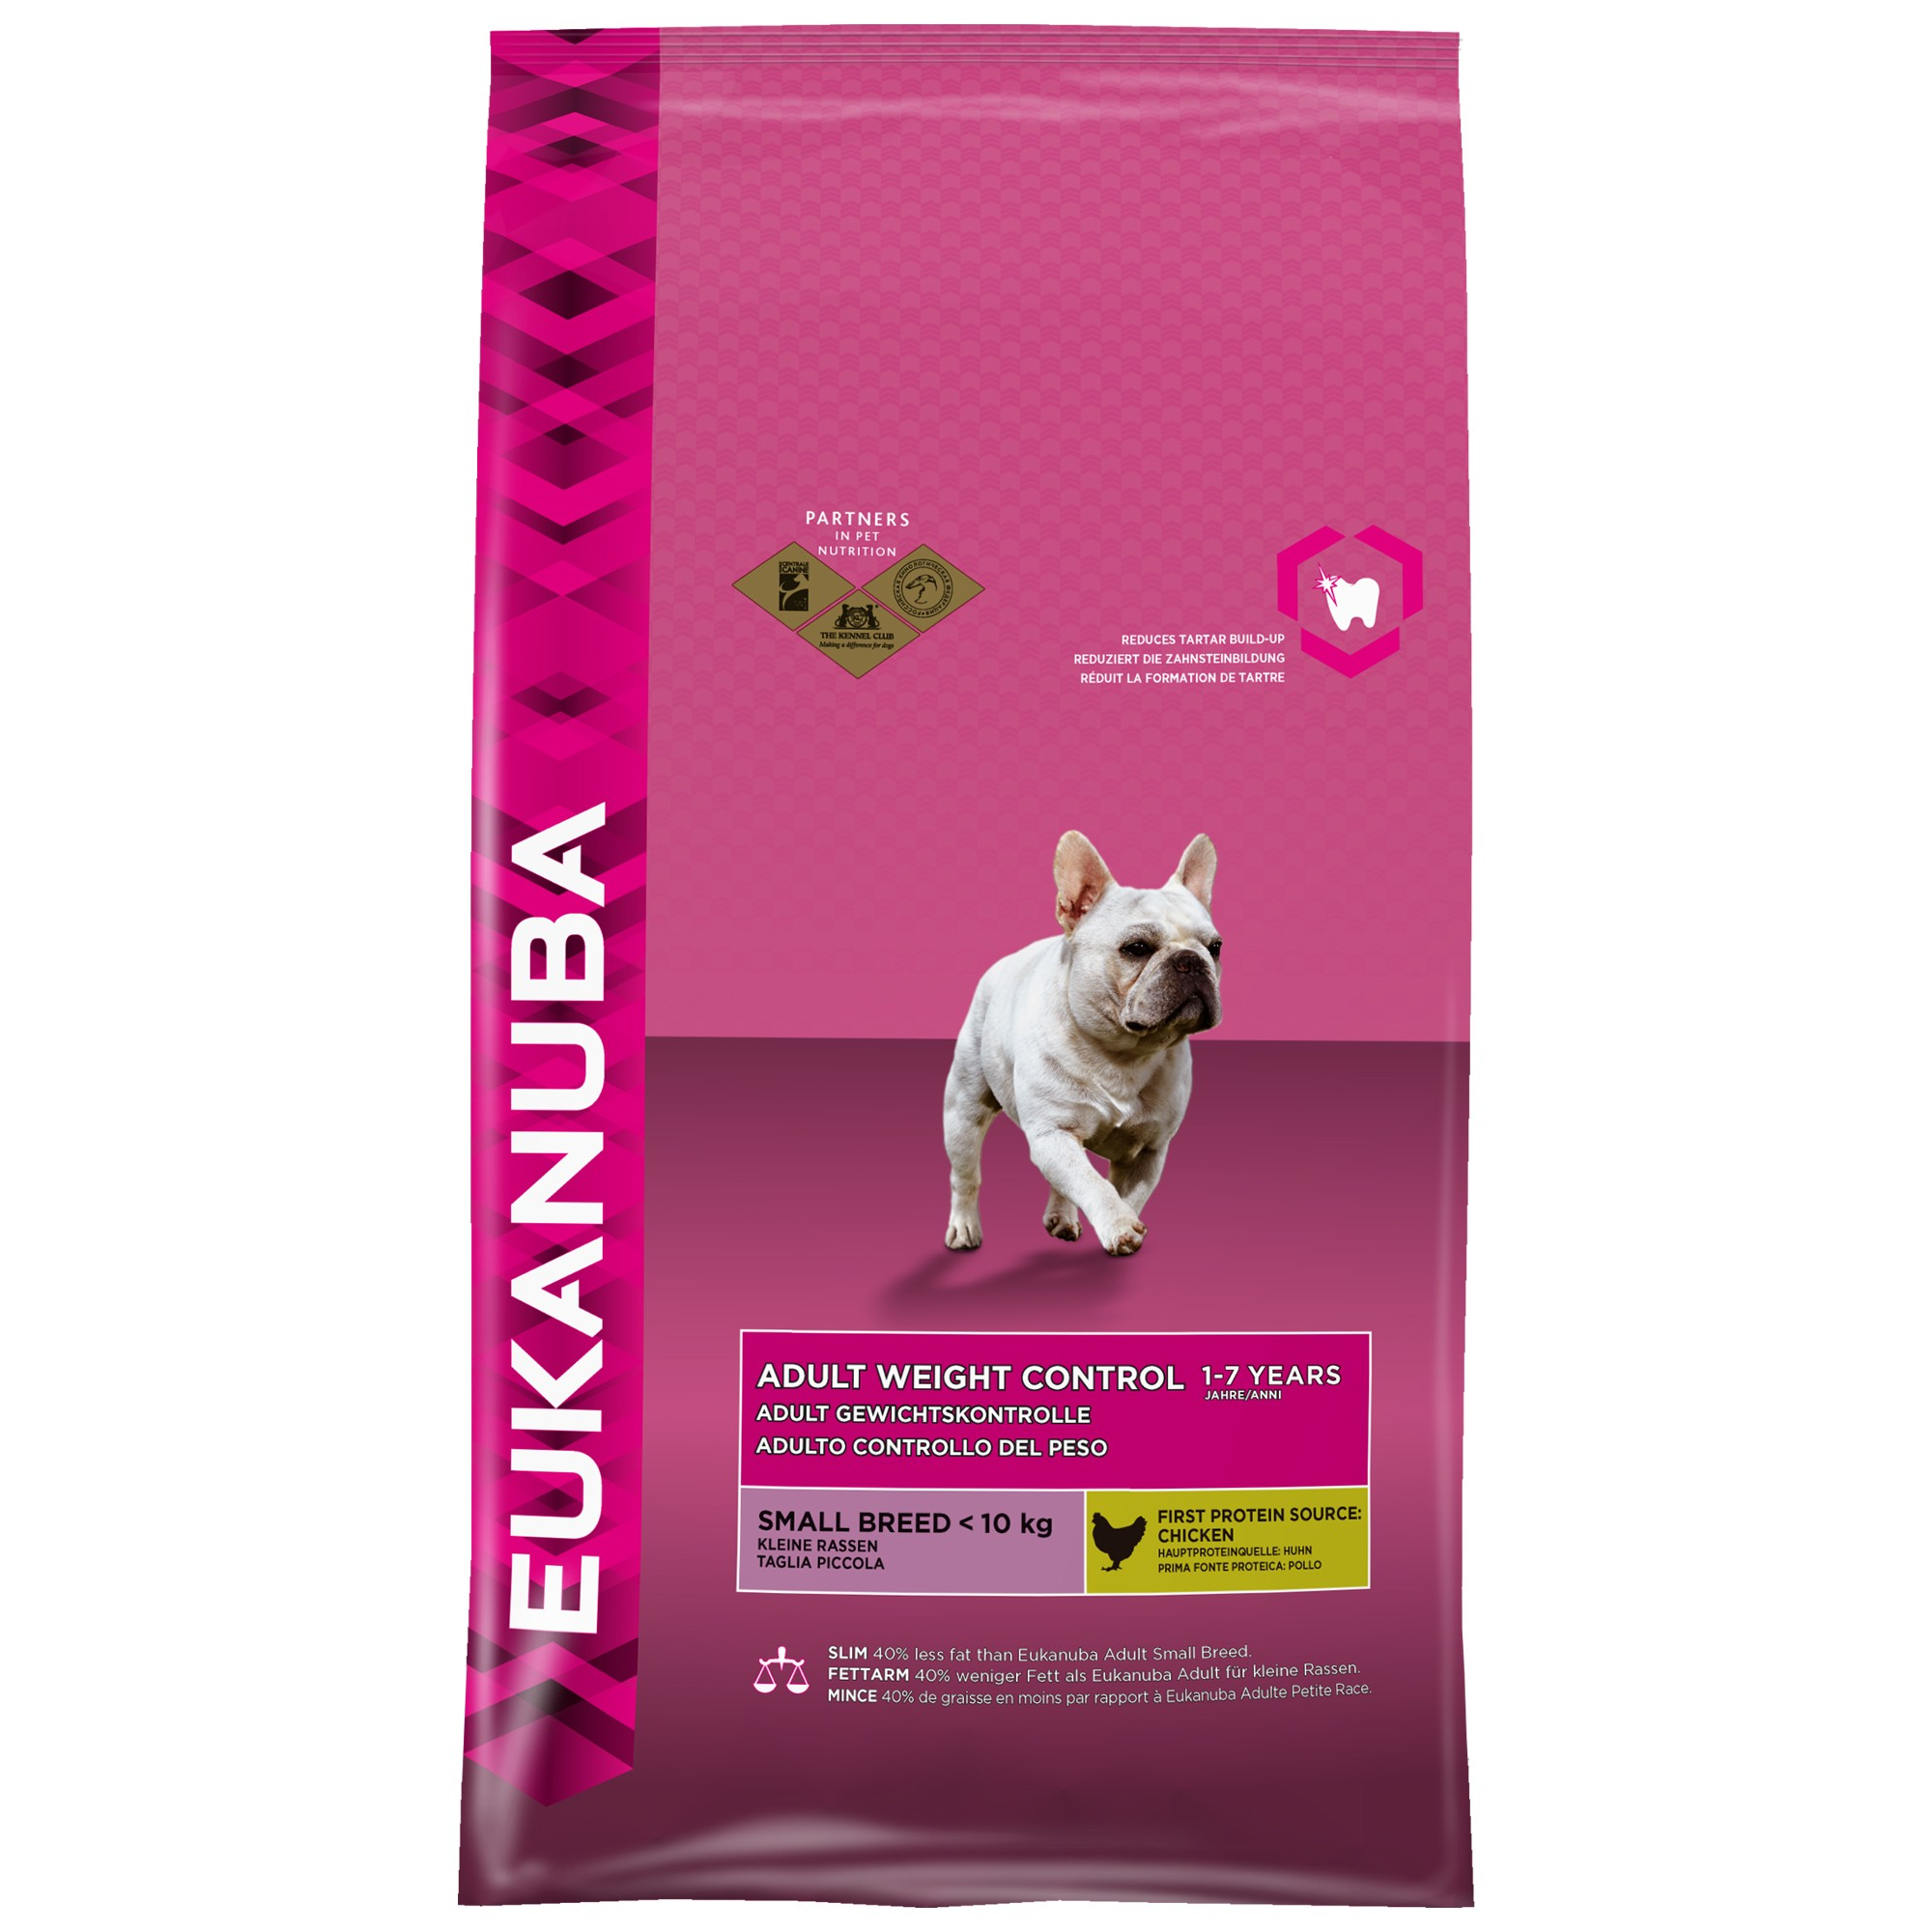 Eukanuba Adult Weight Control Small Breed hondenvoer